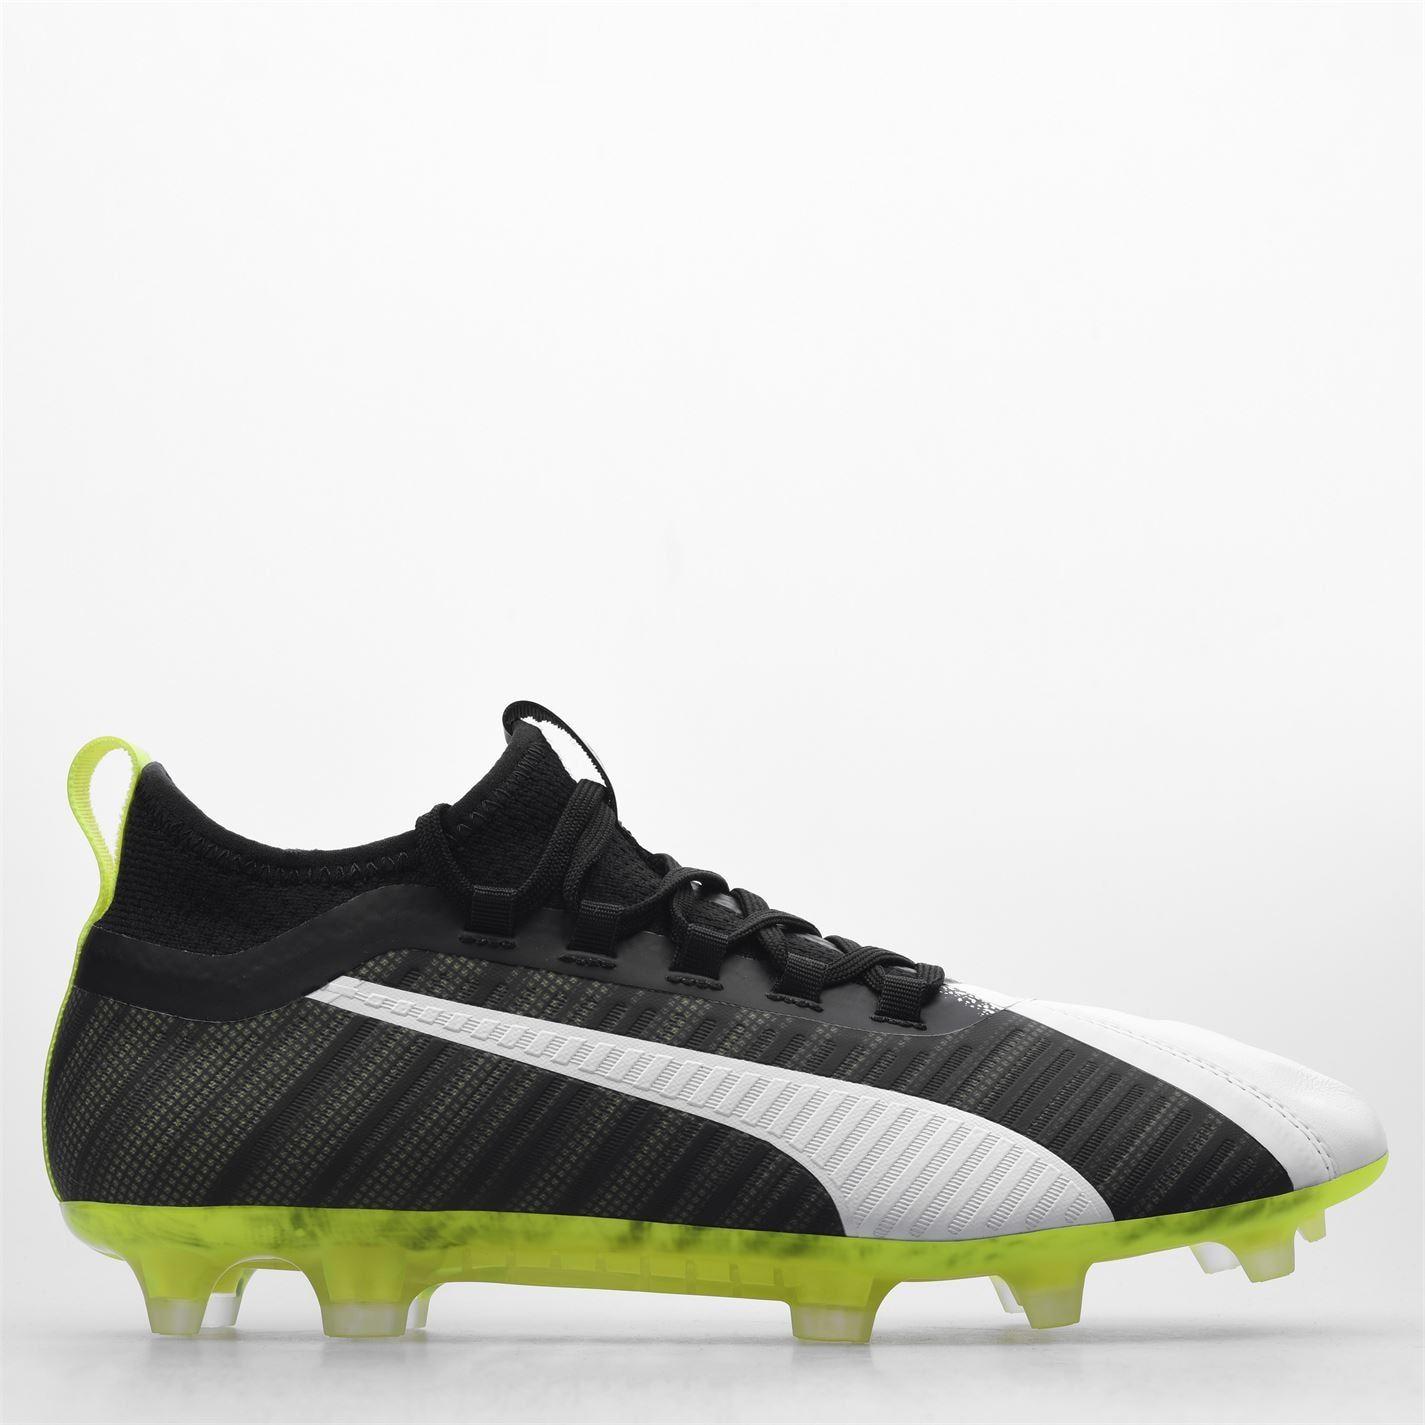 miniature 13 - Puma-5-2-FG-Firm-Ground-Football-Bottes-Homme-Chaussures-De-Foot-Crampons-Baskets